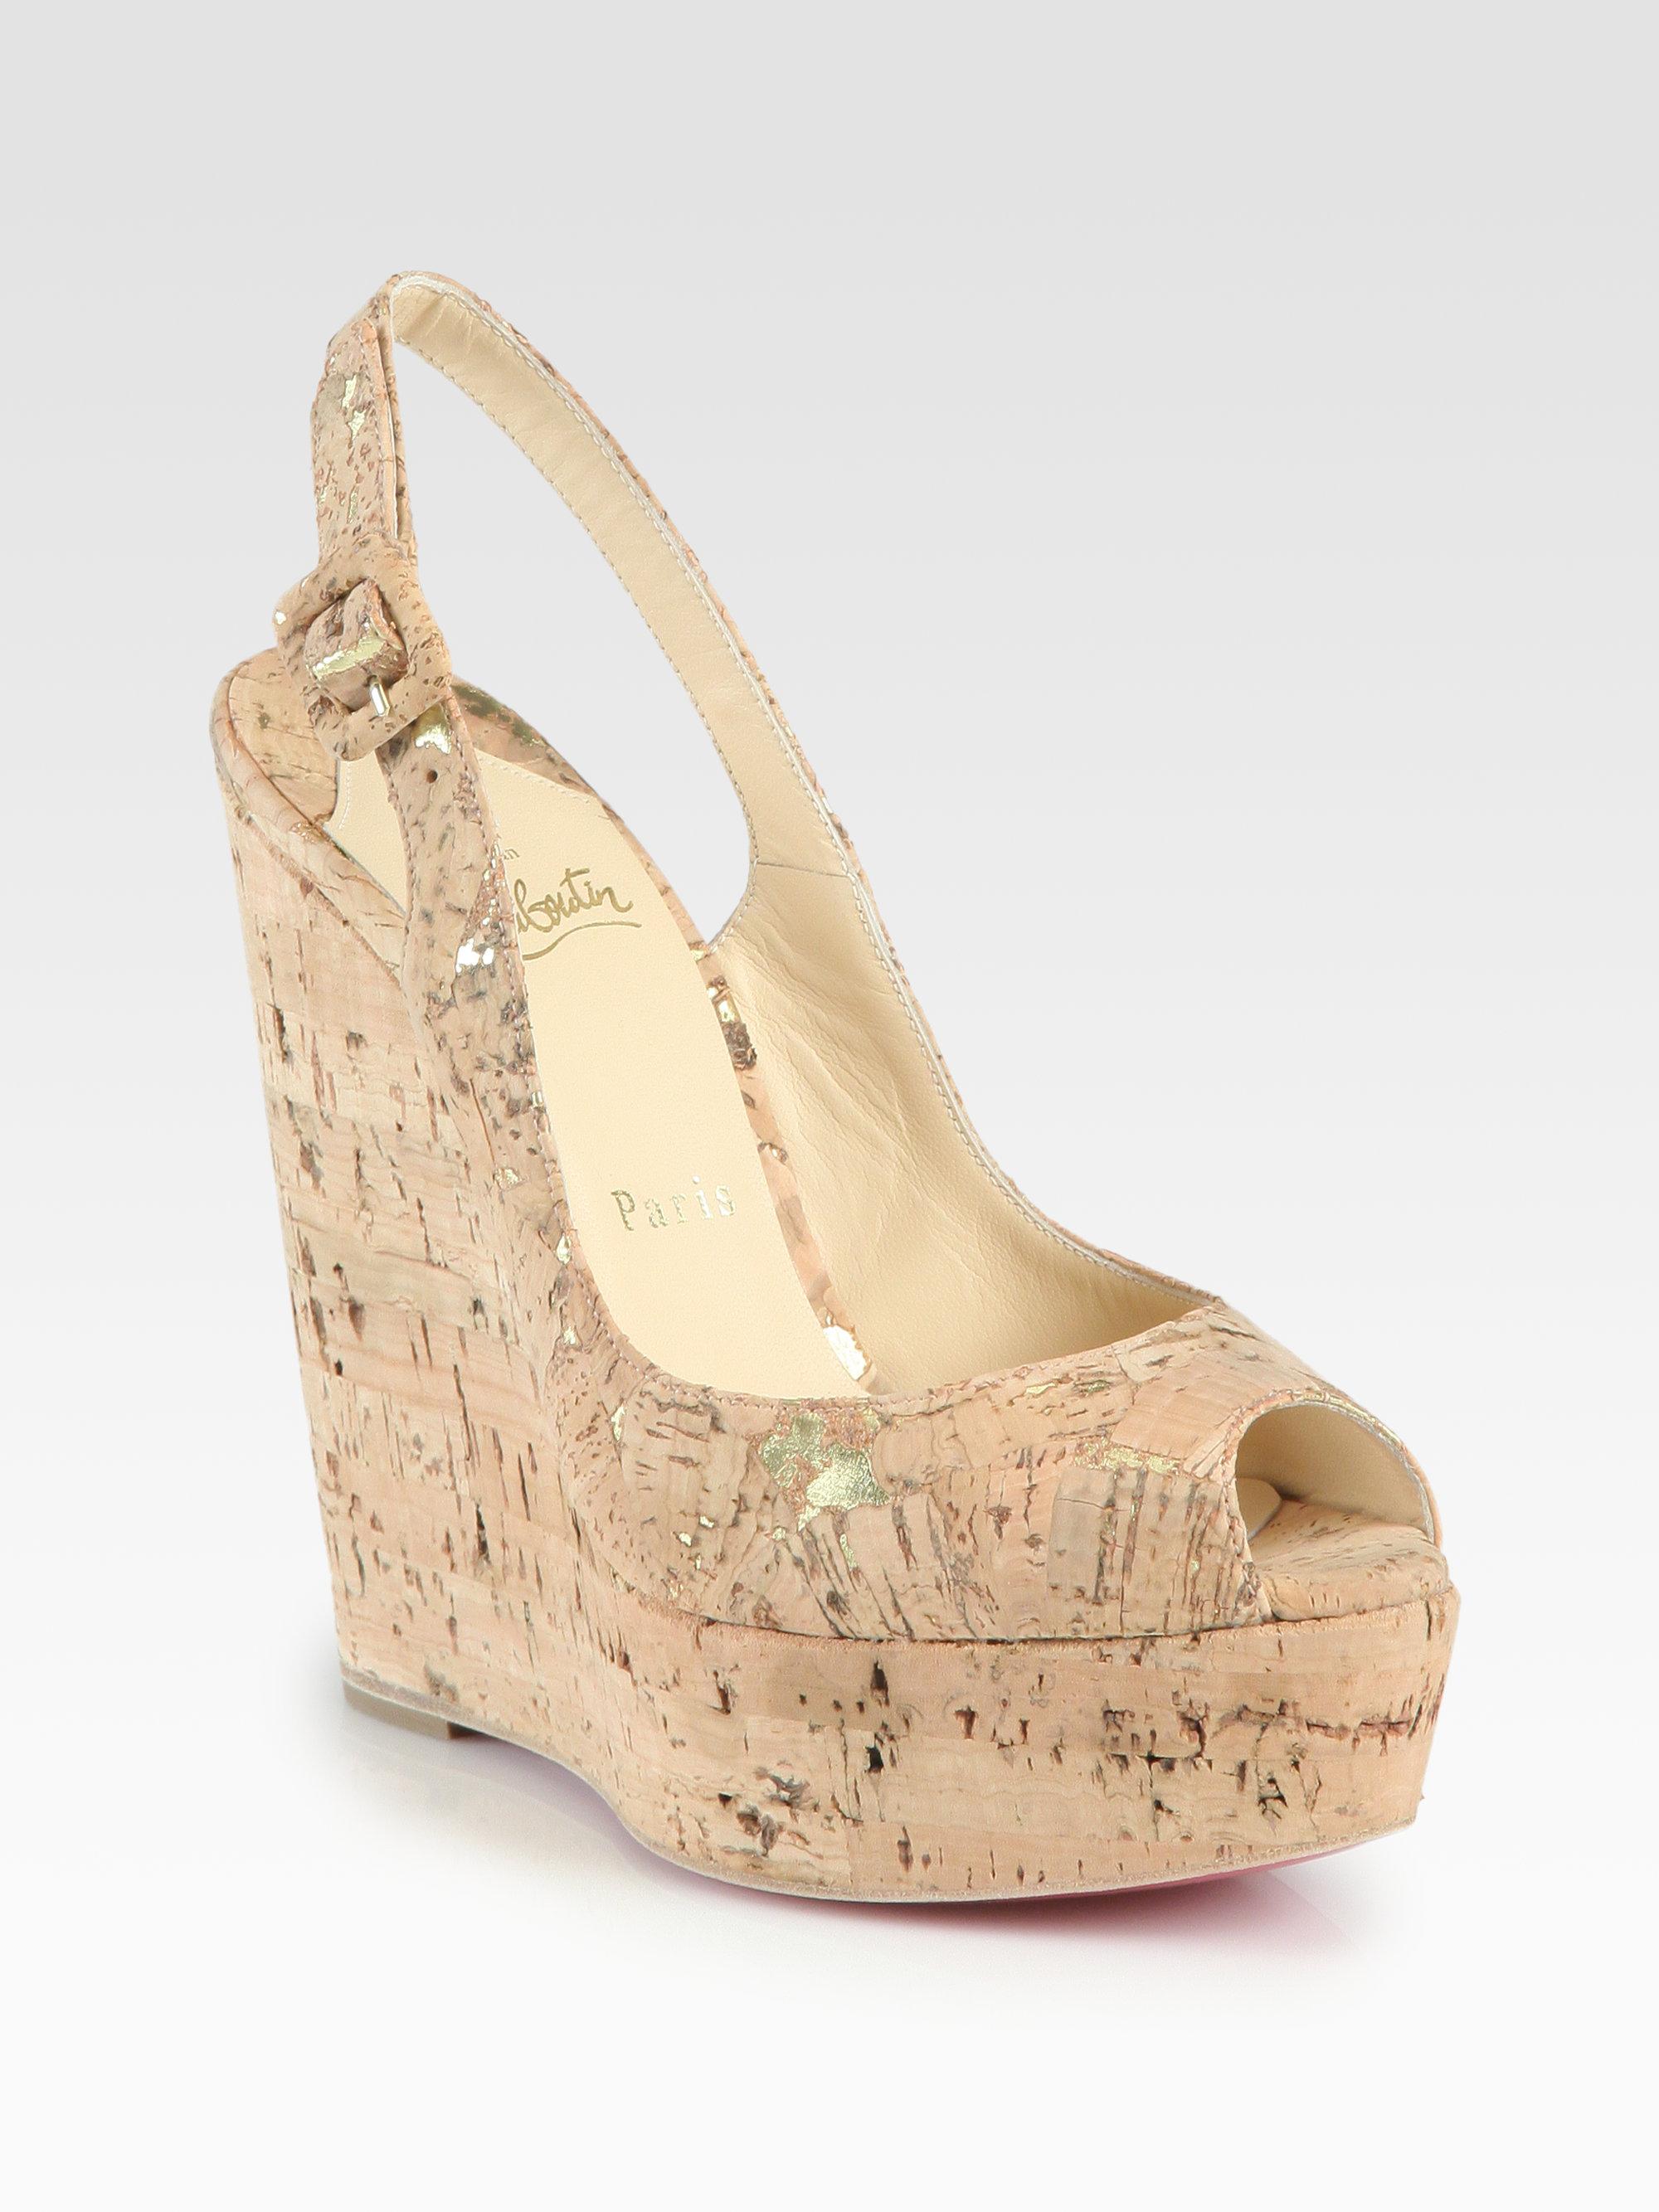 christian louboutin slingback sandals